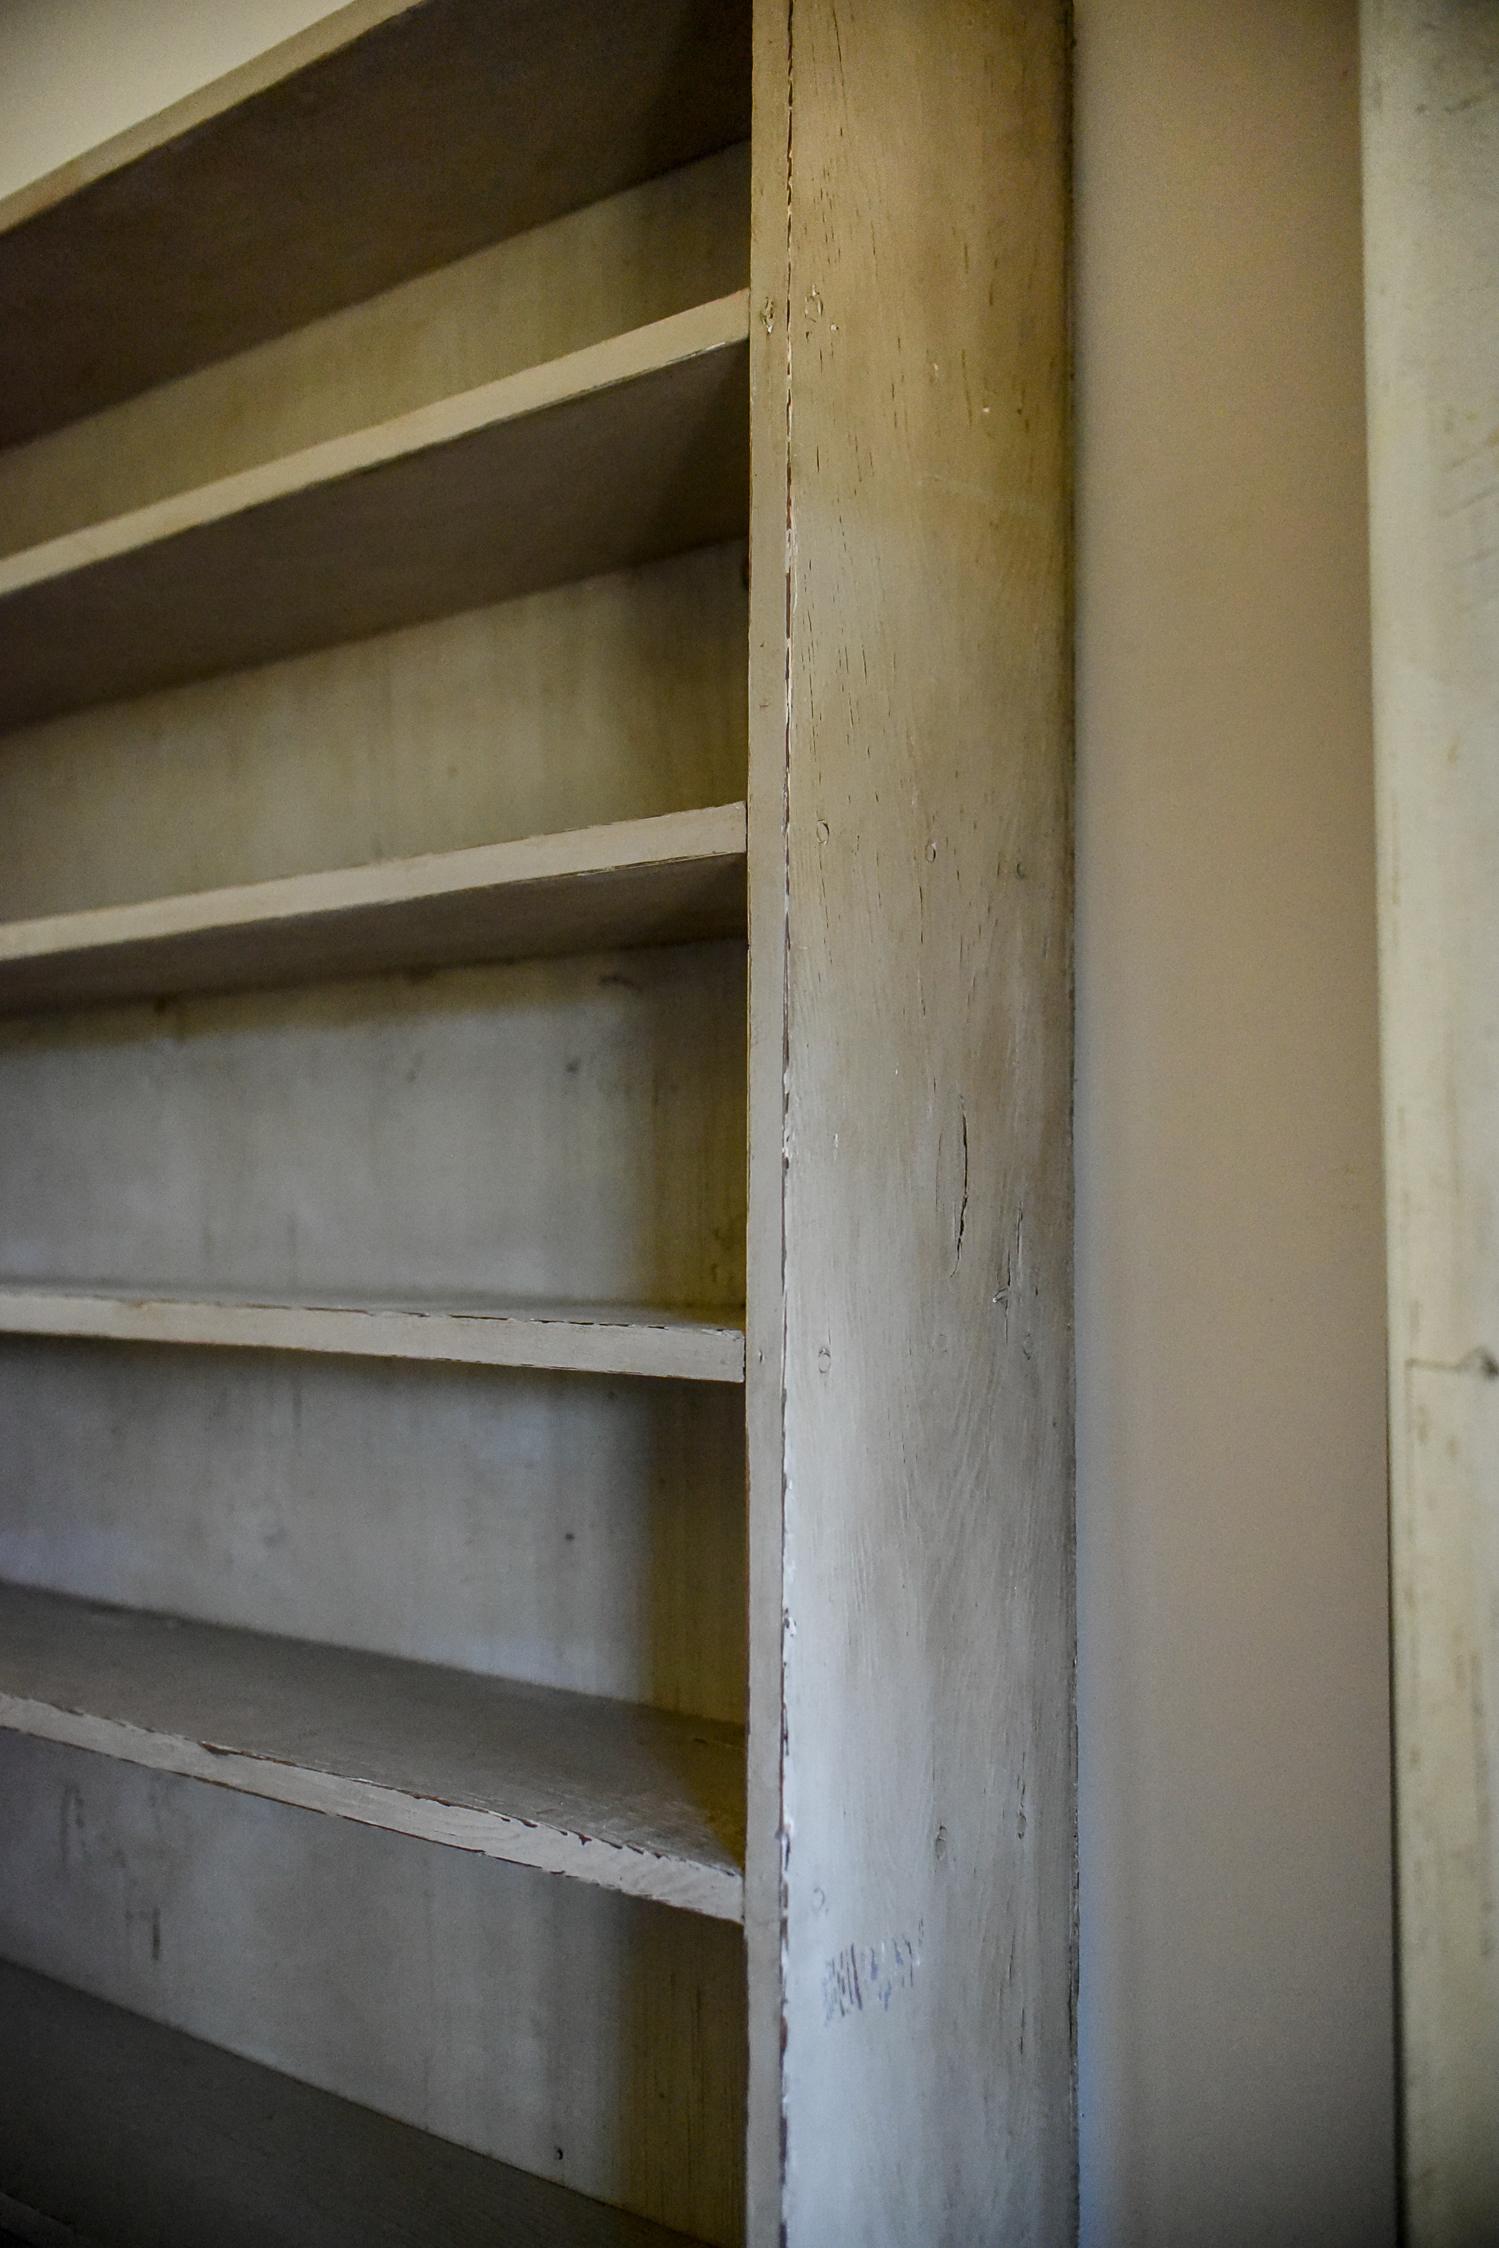 Pantry Shelving Unit